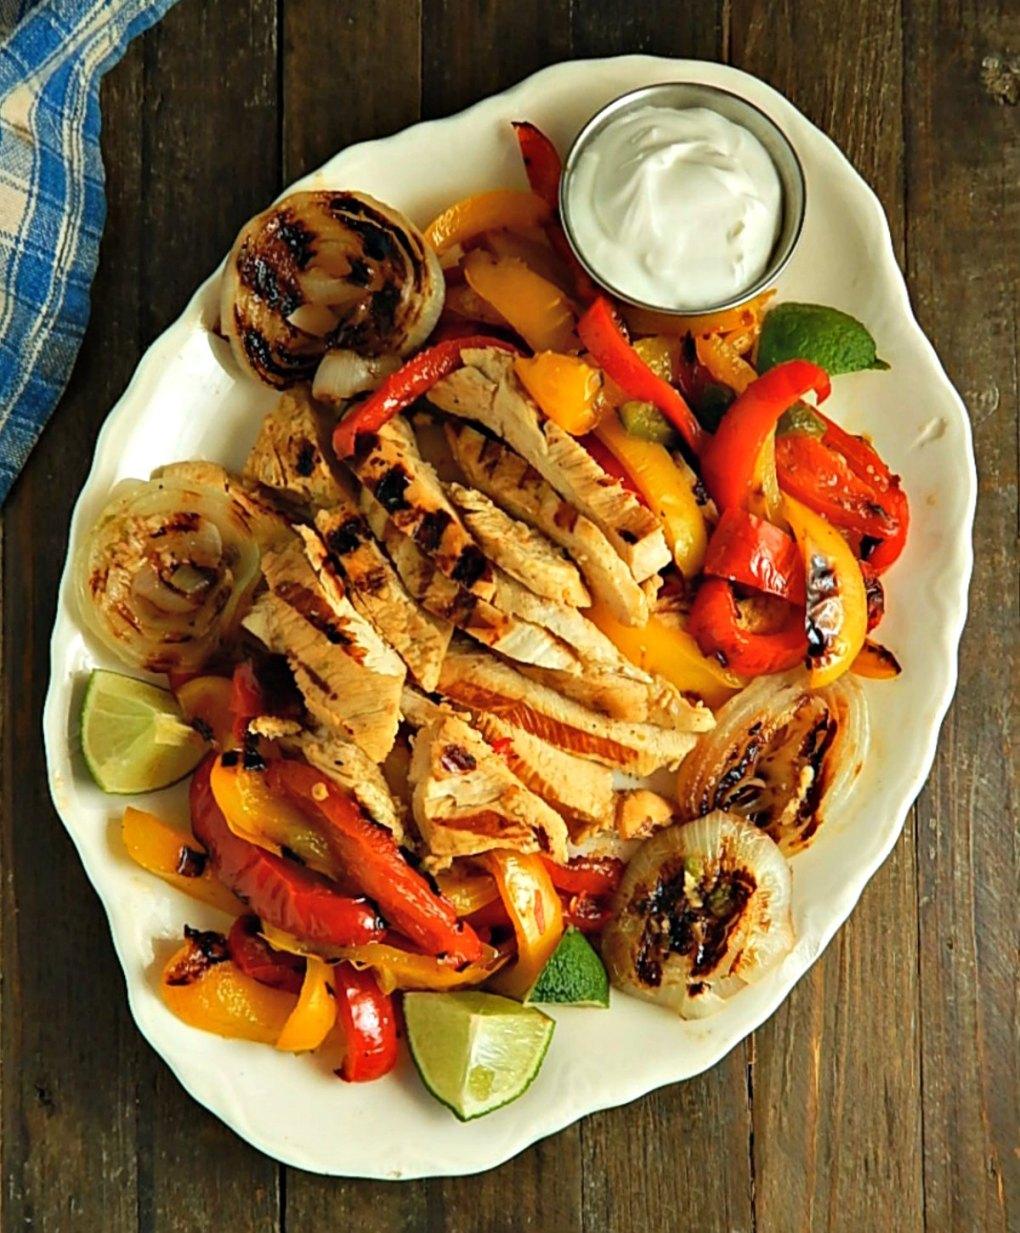 Classic Grilled Chicken Fajitas